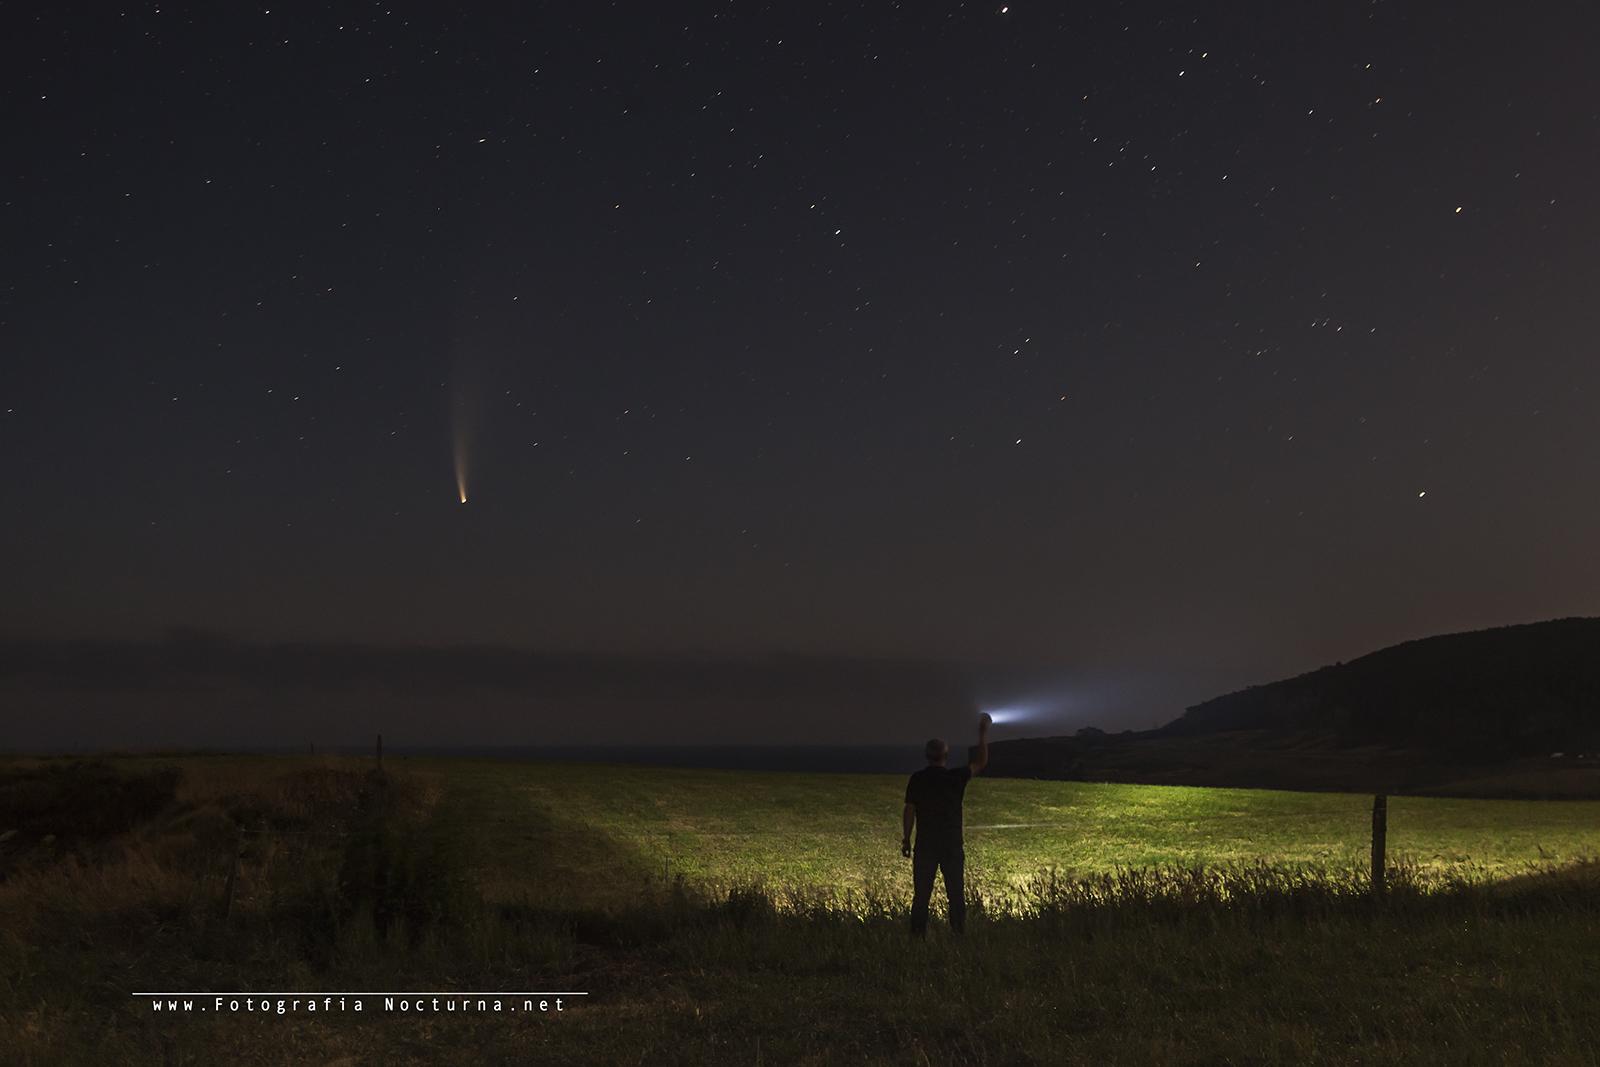 Cometa C/2020 F3 (NEOWISE)